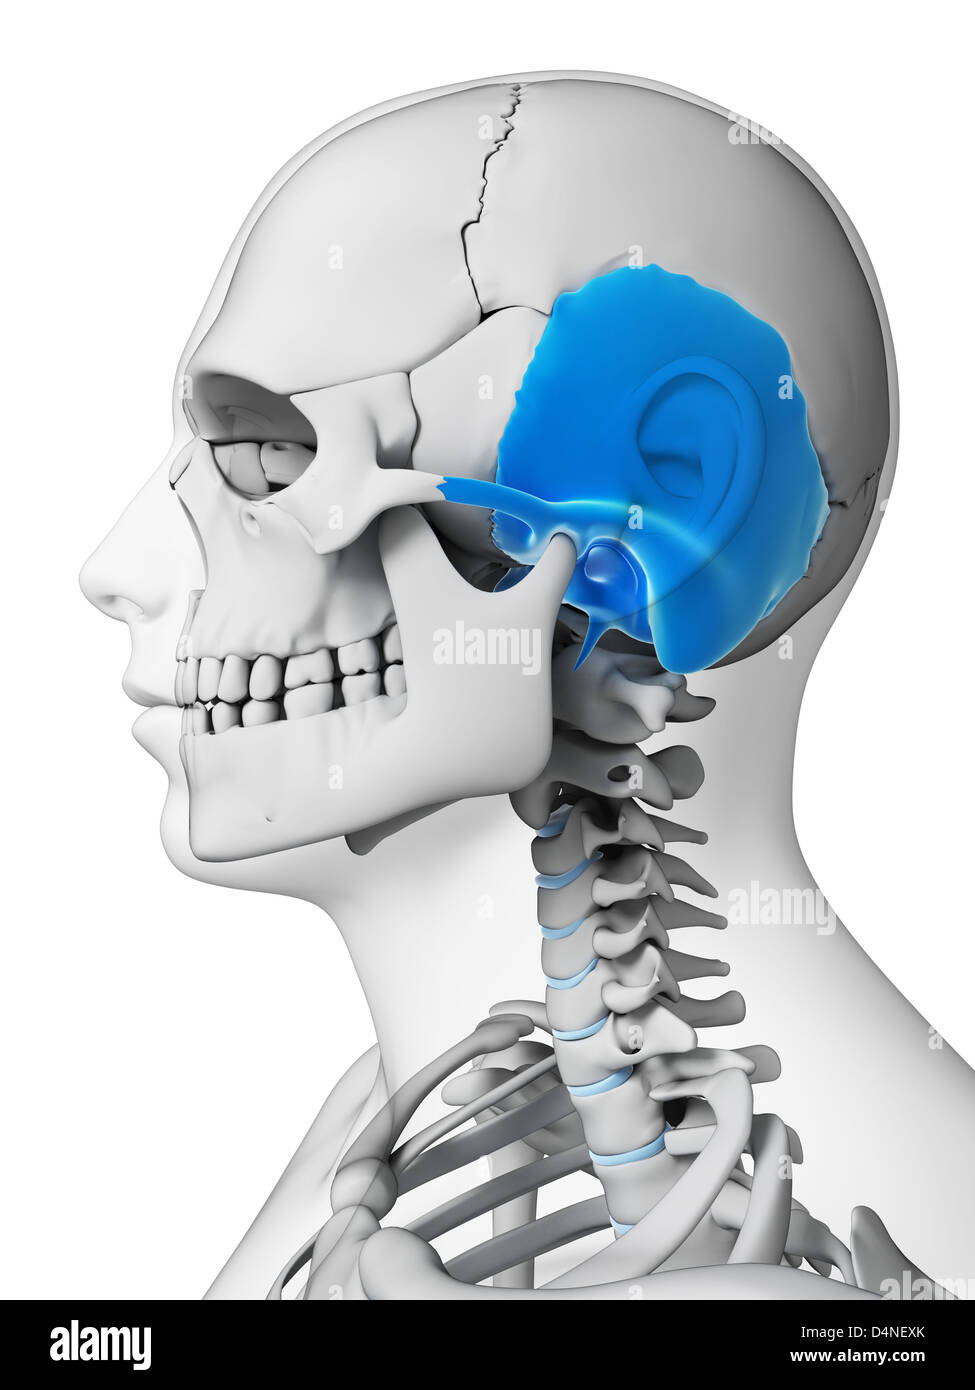 Male Temporal Bone Skull Anatomy Stock Photos & Male Temporal Bone ...